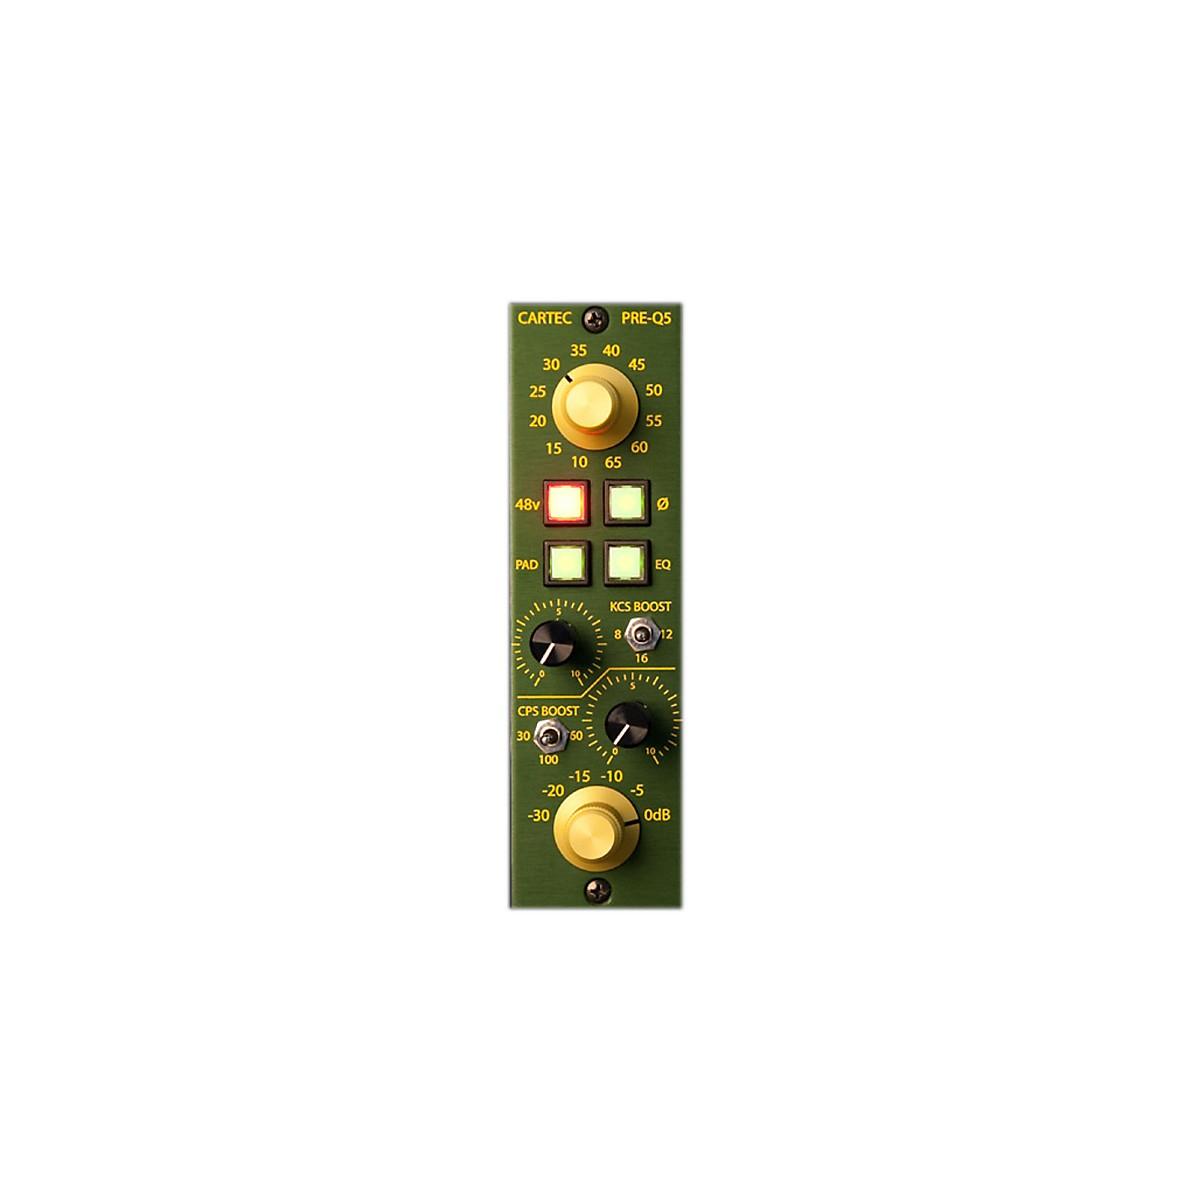 CARTEC Audio PRE-Q5 API 500 Series Mic Preamp